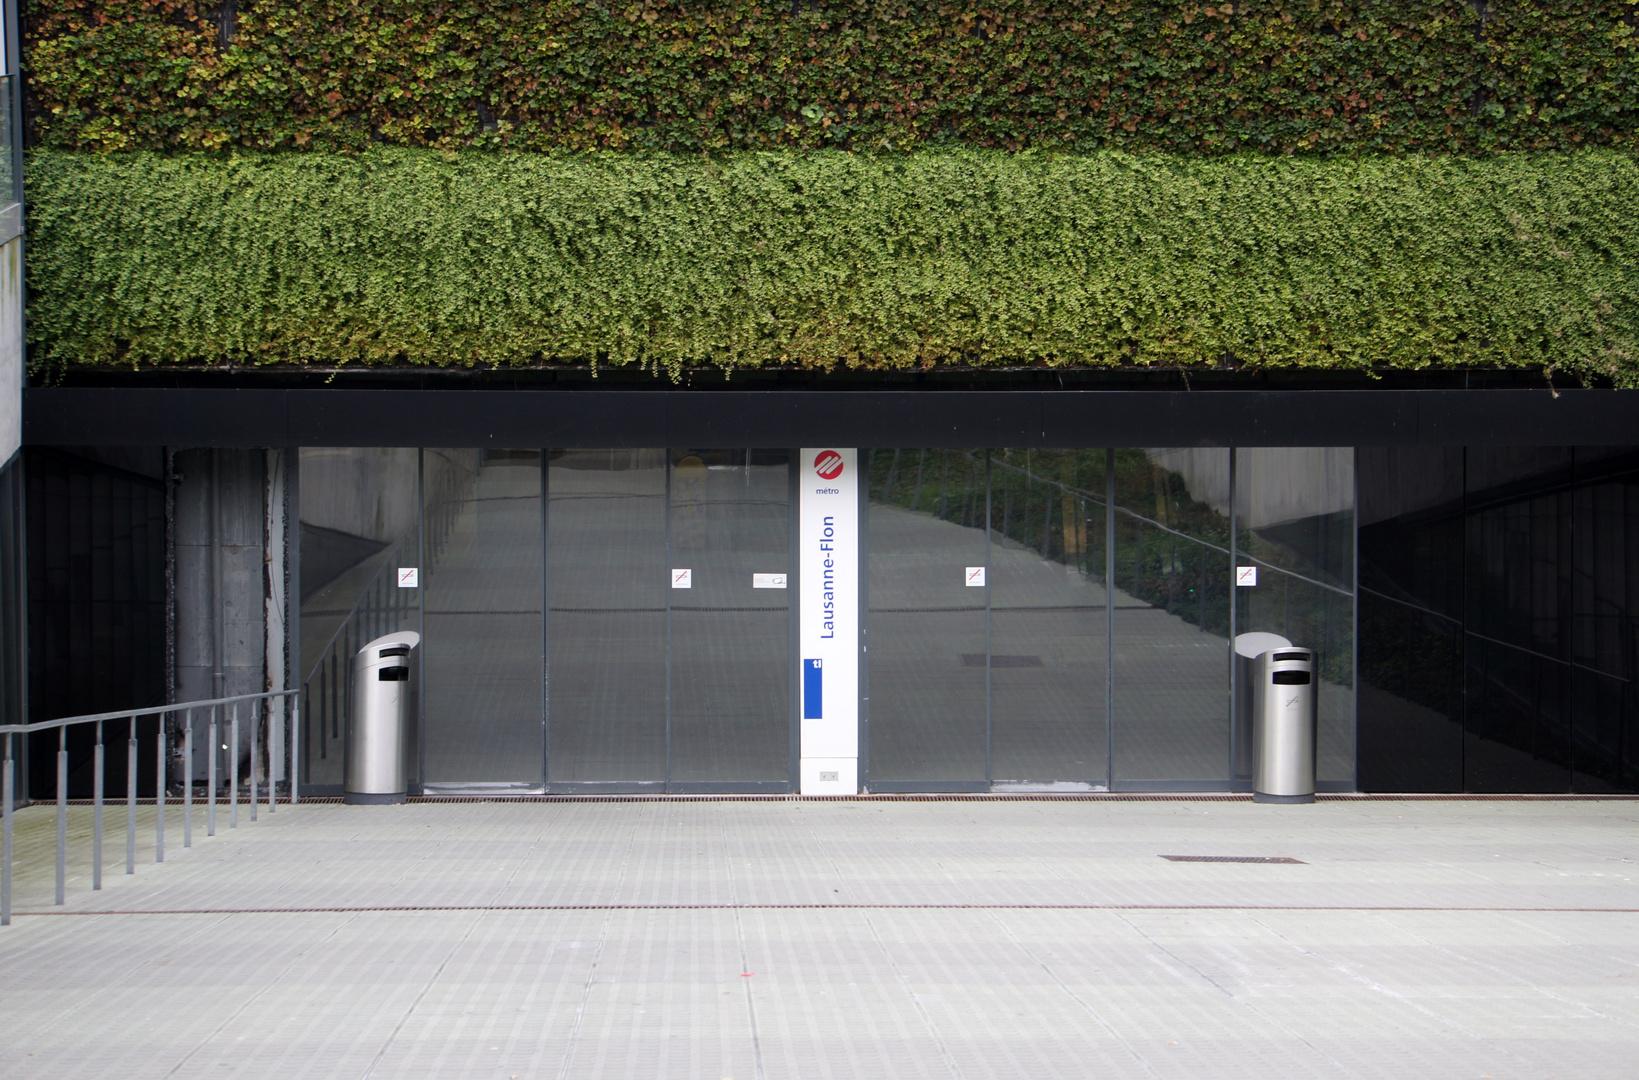 Lausanne, Schweiz, S-Bahn Haltestelle Lausanne-Flon